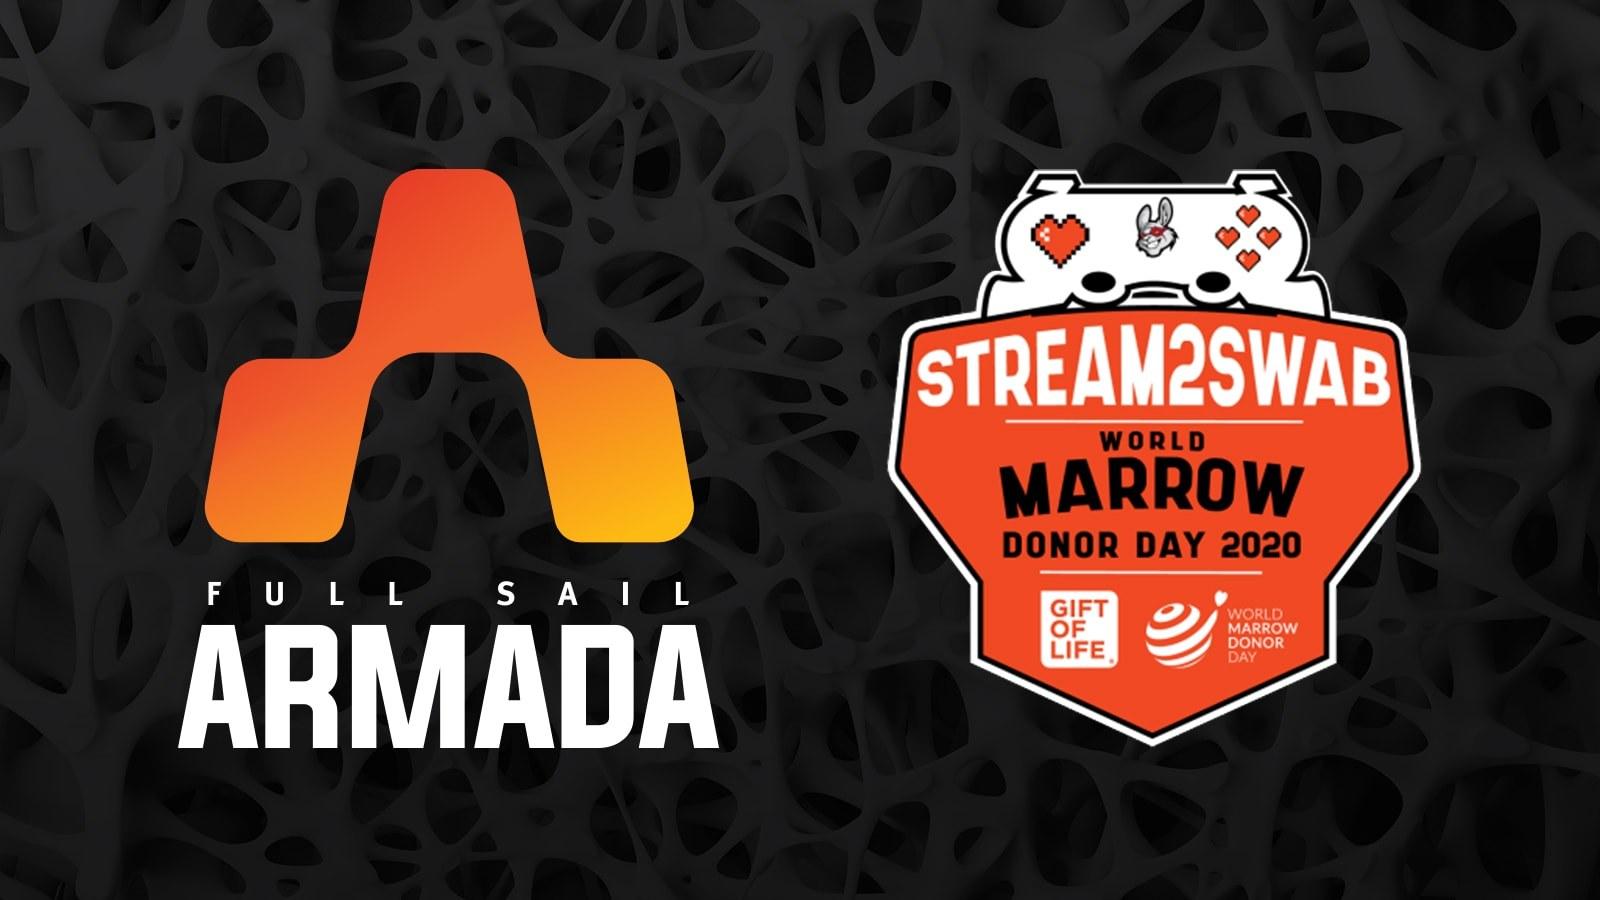 Full Sail Armada Athletes Take Part in World Marrow Donor Day - Hero image